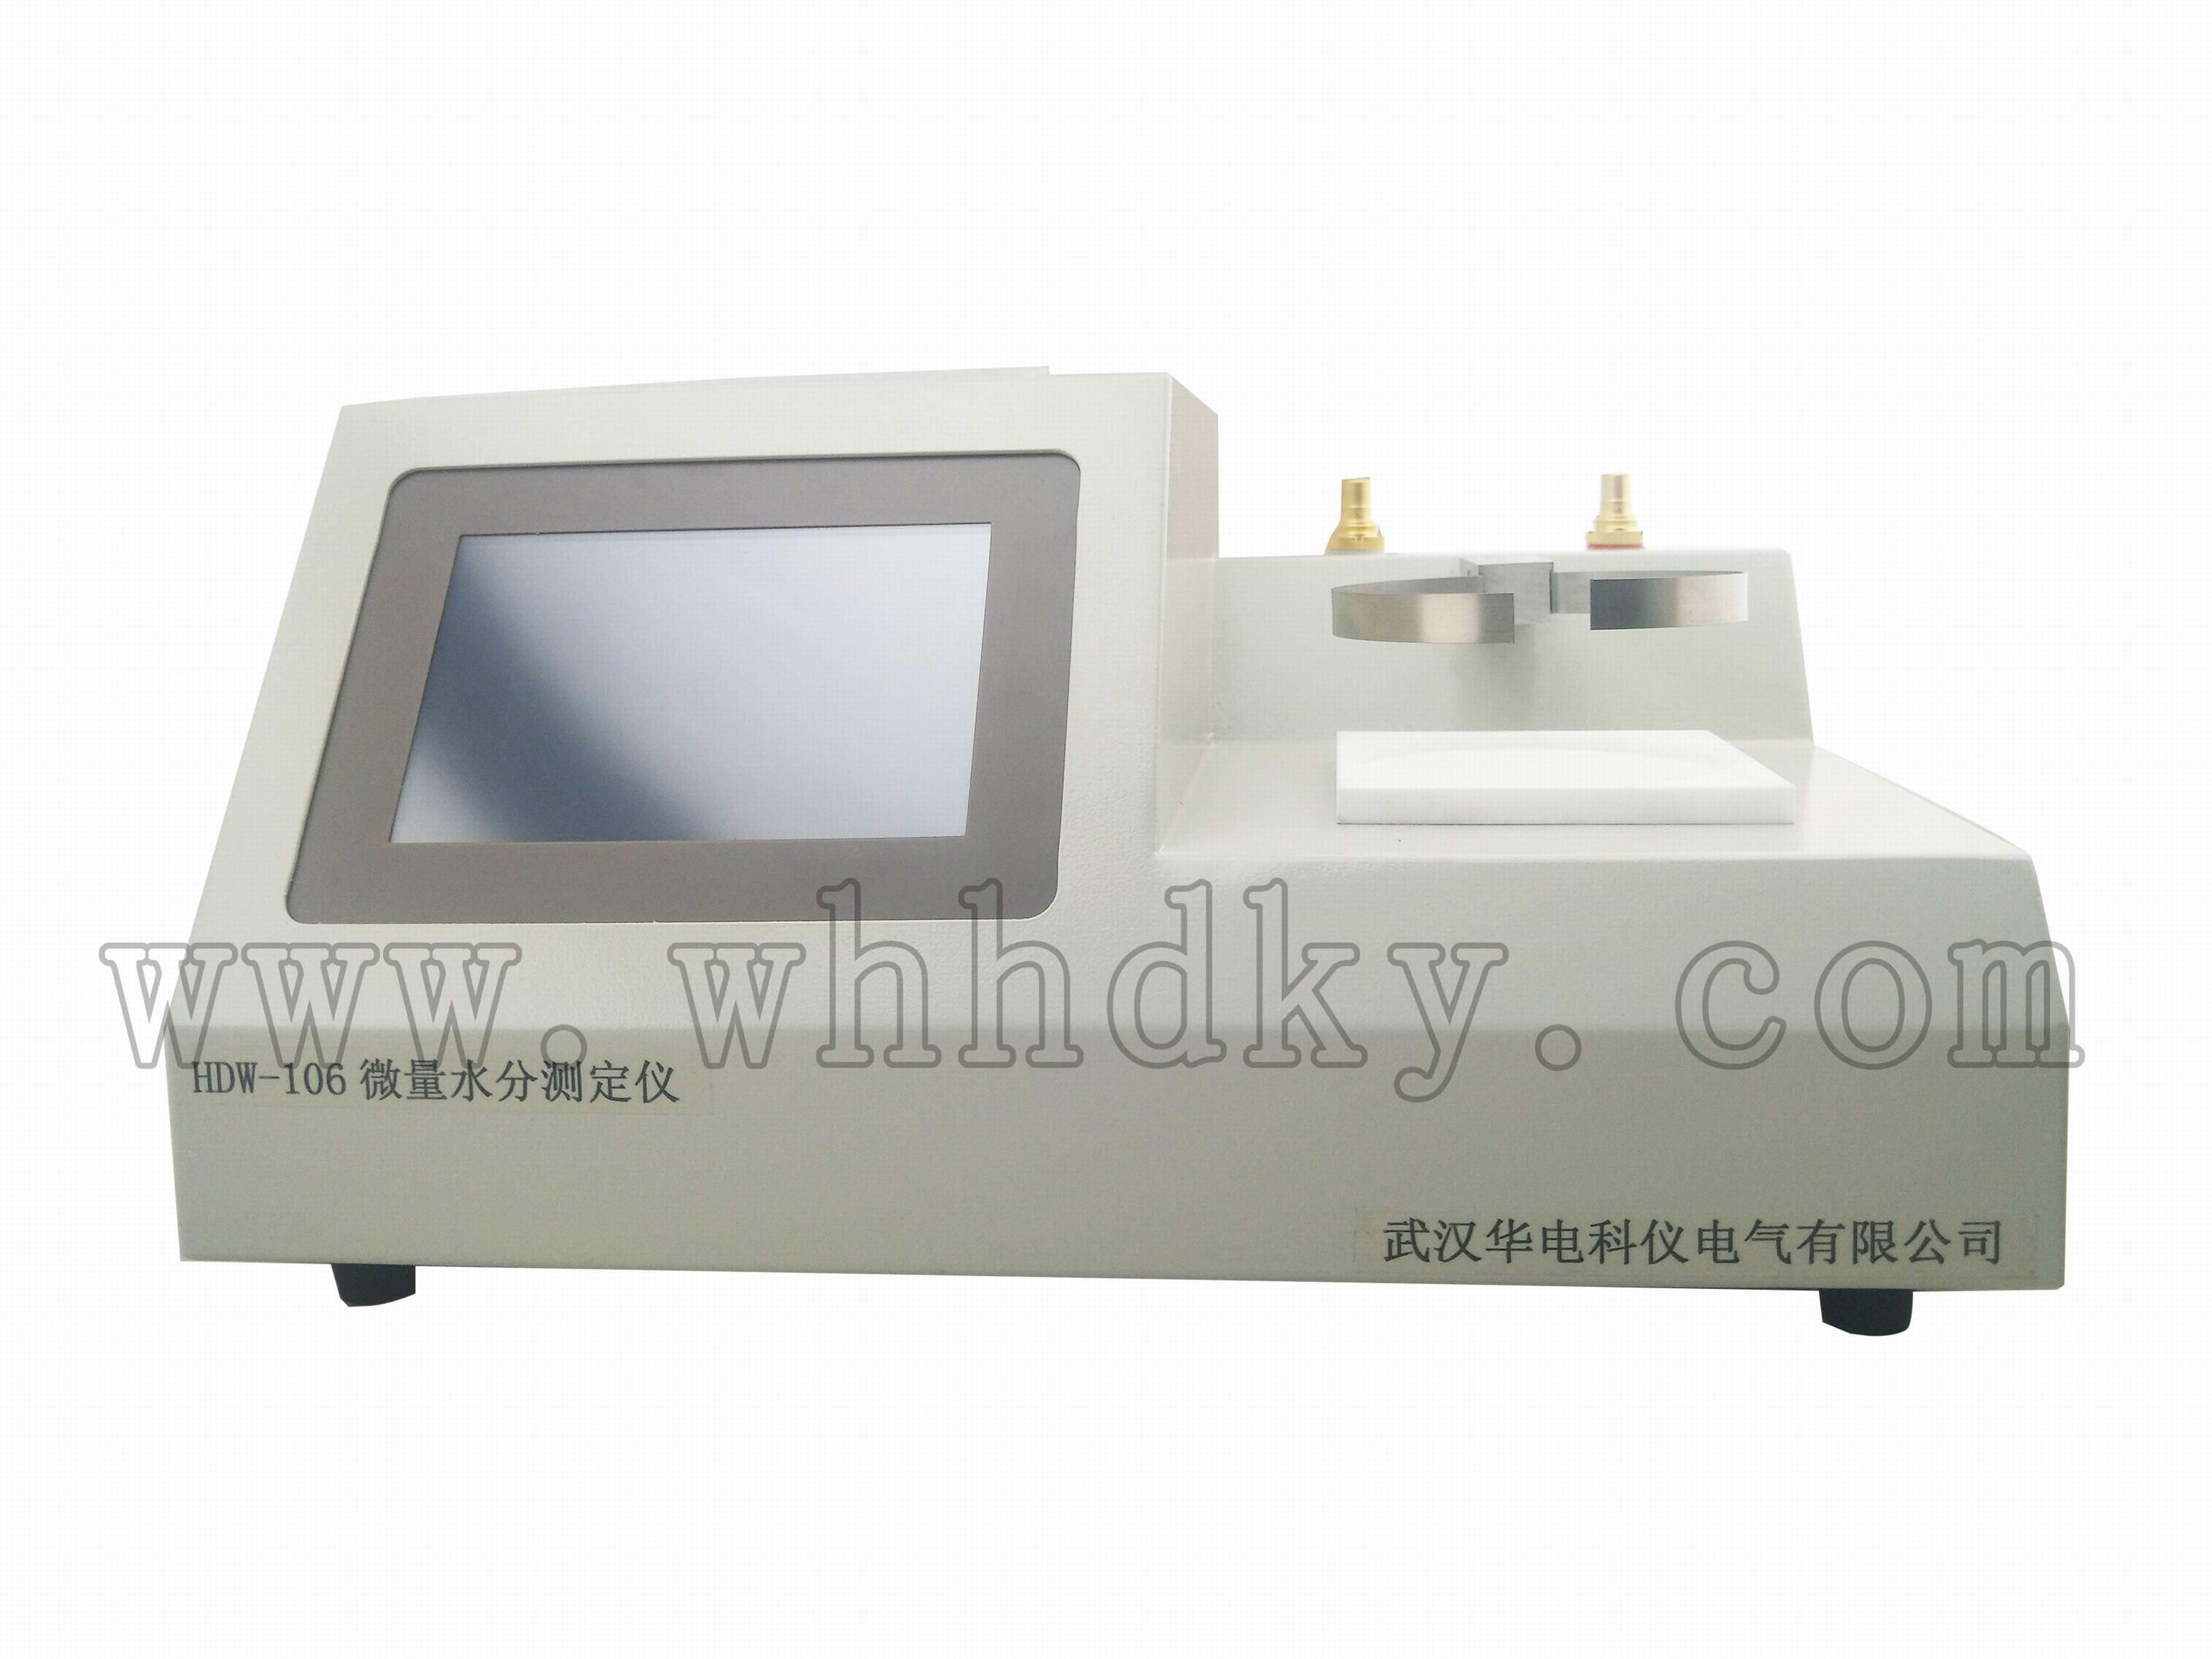 HDW-106微量水份测定仪(微水仪)